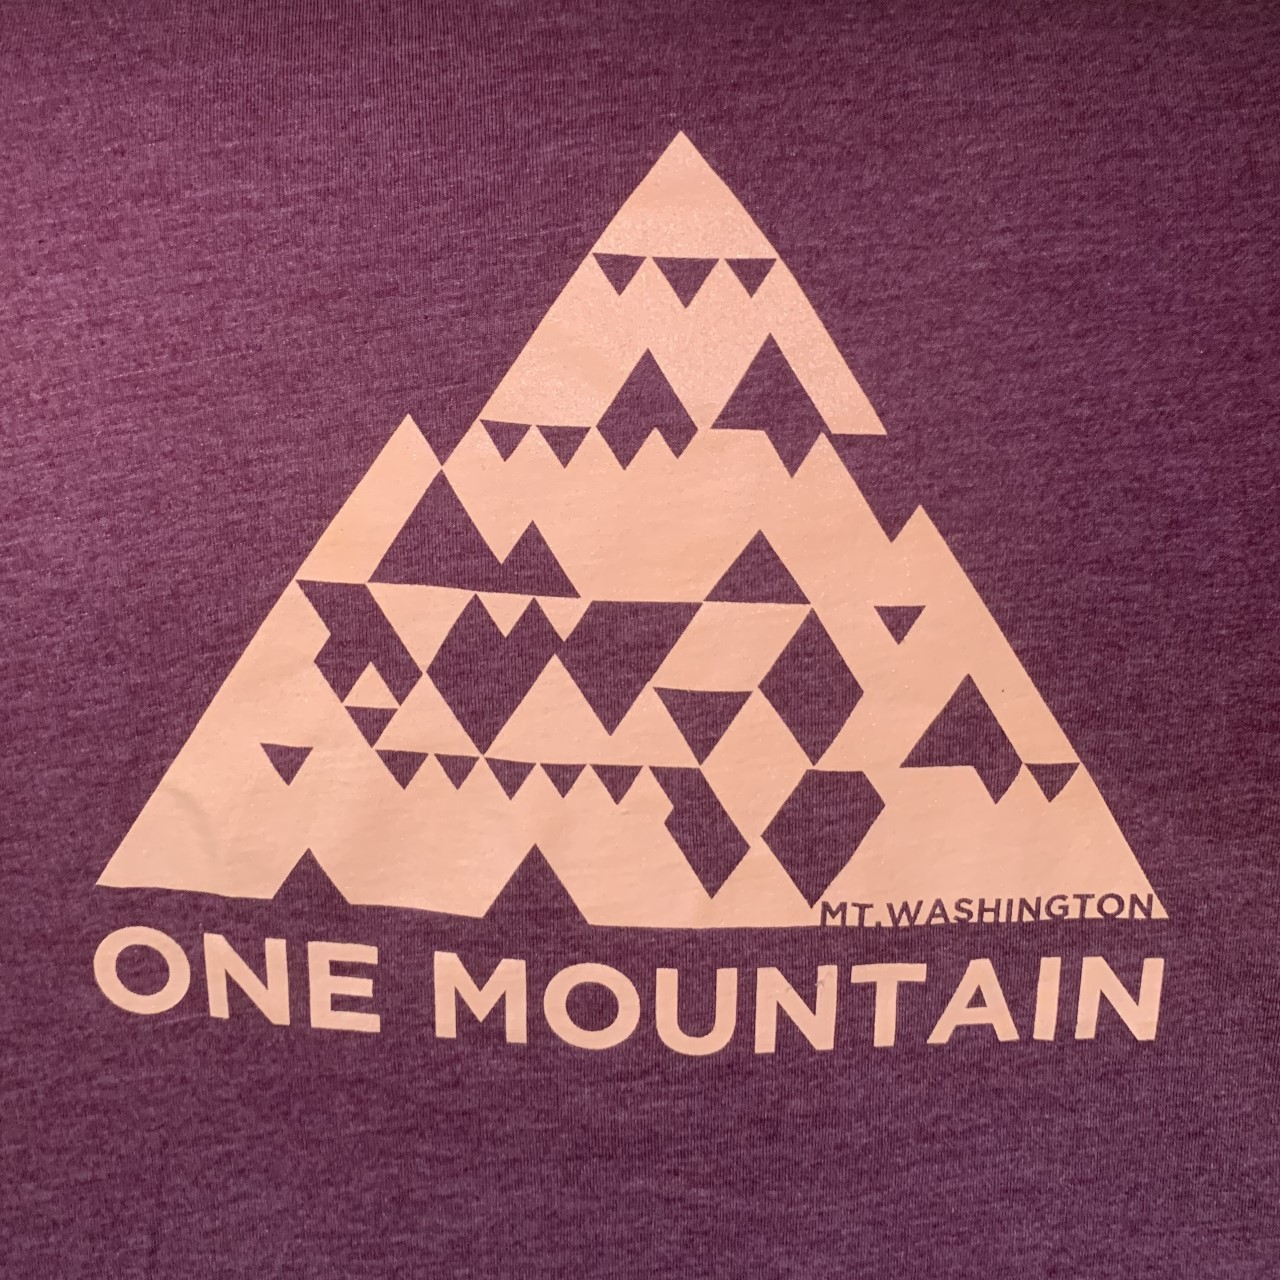 Youth/Teen Crewneck Tee - Heather Maroon/Peach One Mountain